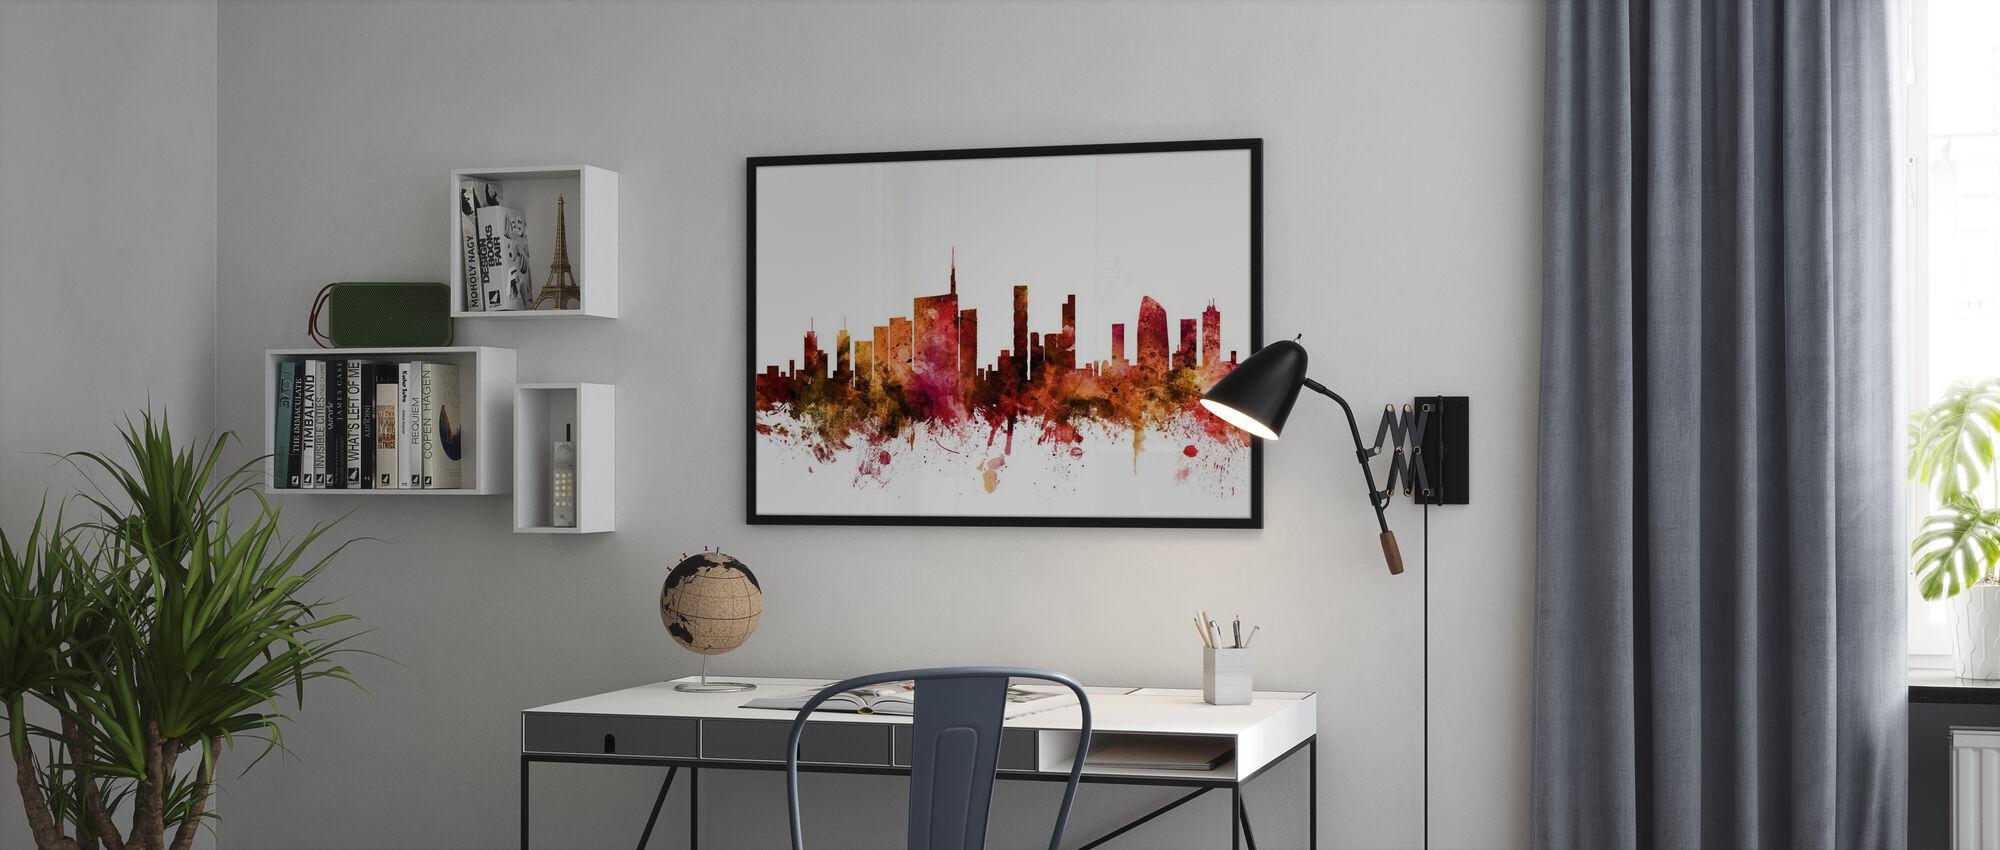 Milan Italy Skyline - Poster - Office